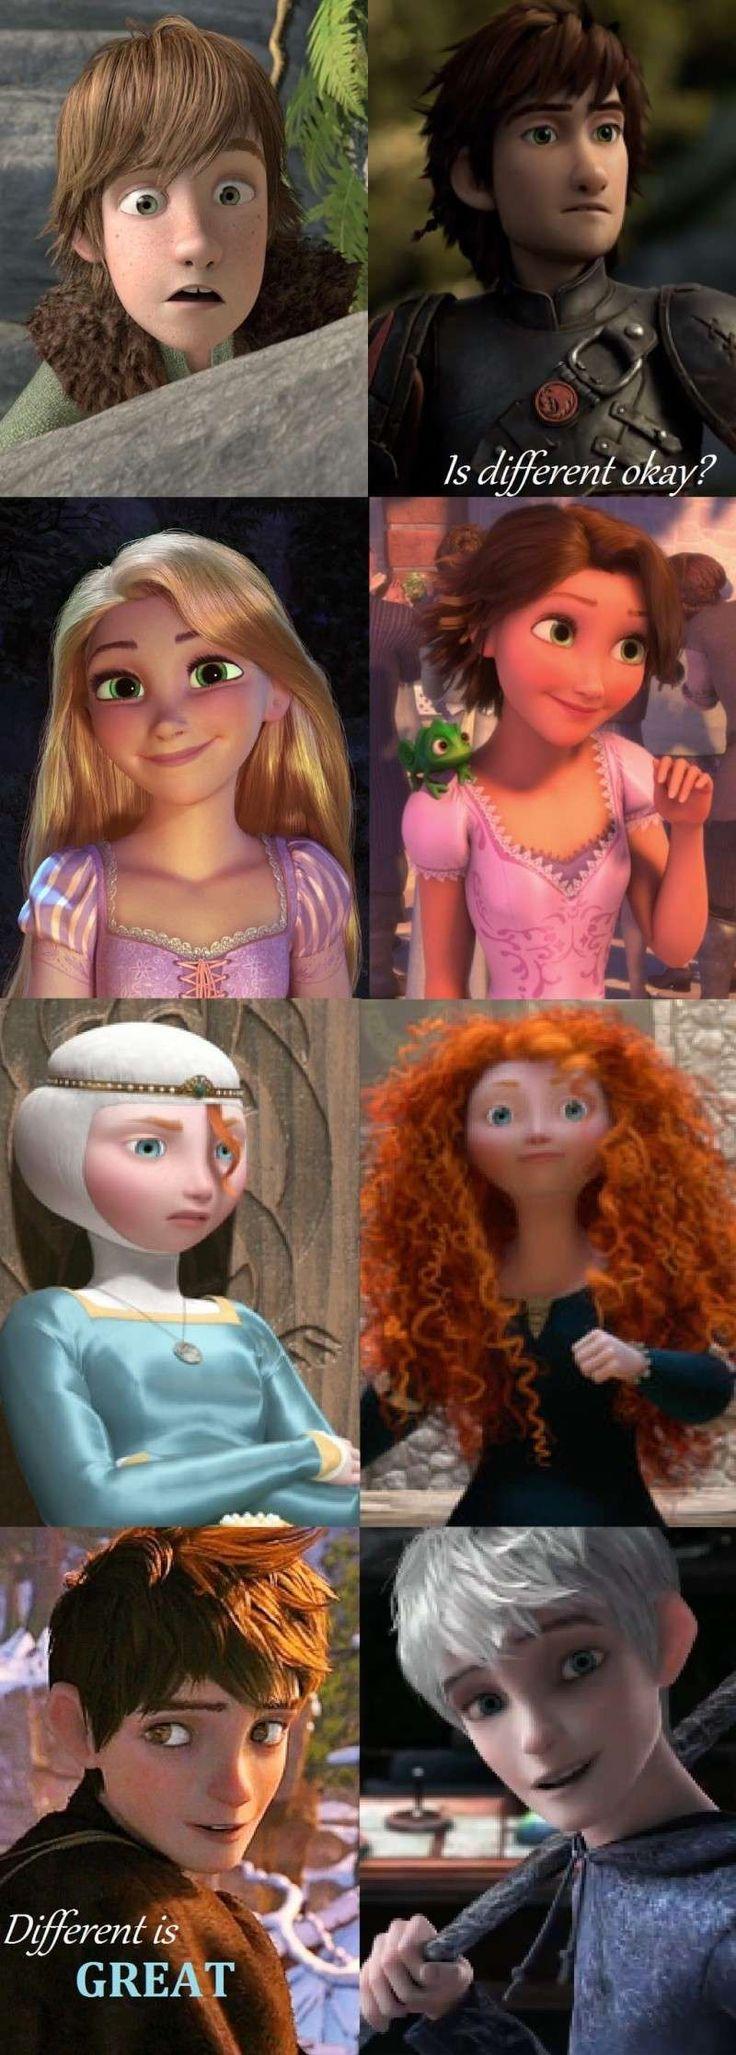 merida hiccup jack rapunzel   Fan art) Merida, Rapunzel, Jack et Hiccup - The Big Four - Page 24